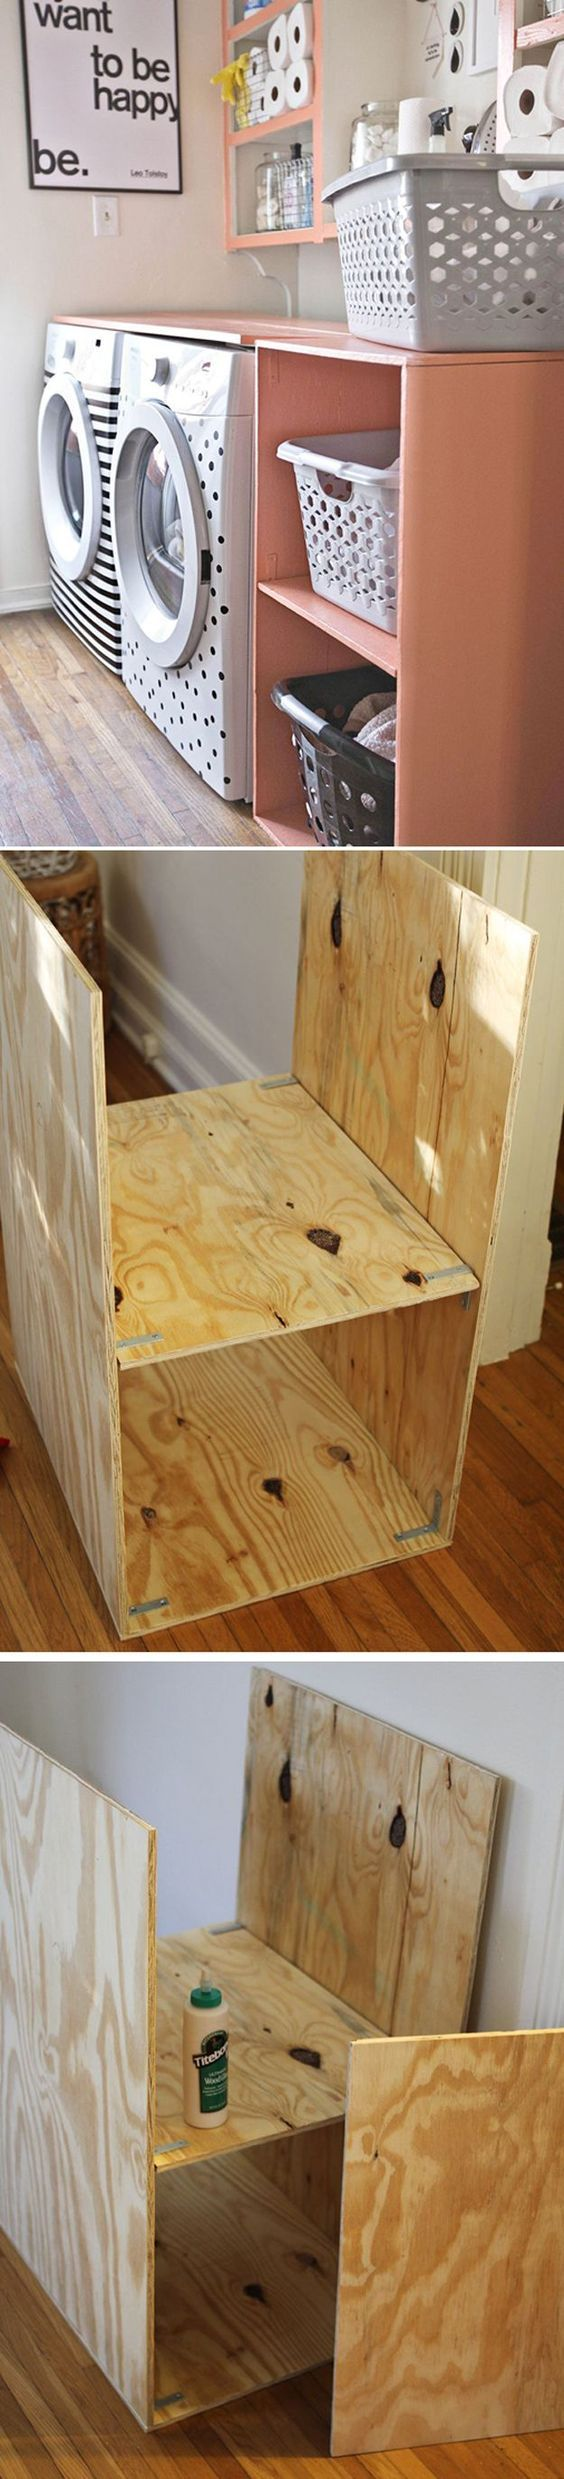 DIY Laundry Room Shelf Tutorial by DIY Ready at diyready.com/…